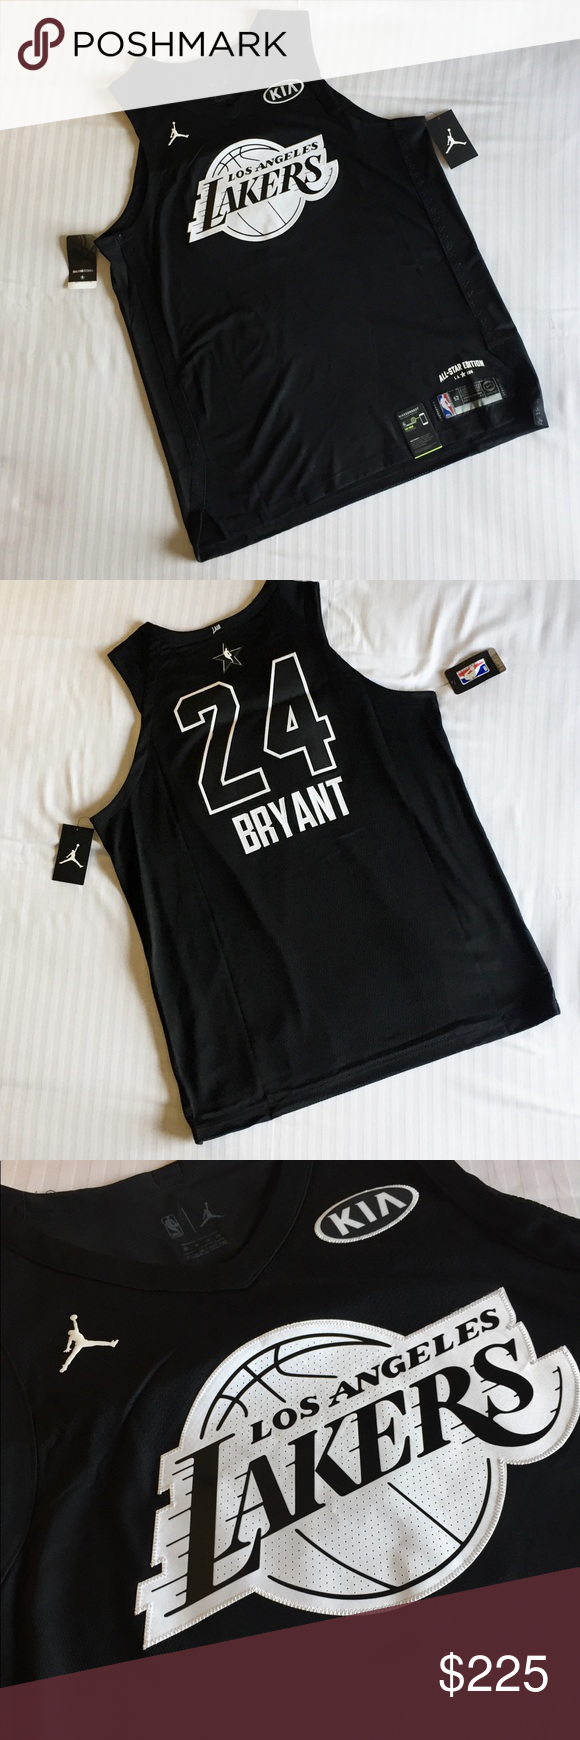 new style 3b5fa 6c658 Jordan Kobe Bryant All Star Jersey LA 928867-016 Selling a ...